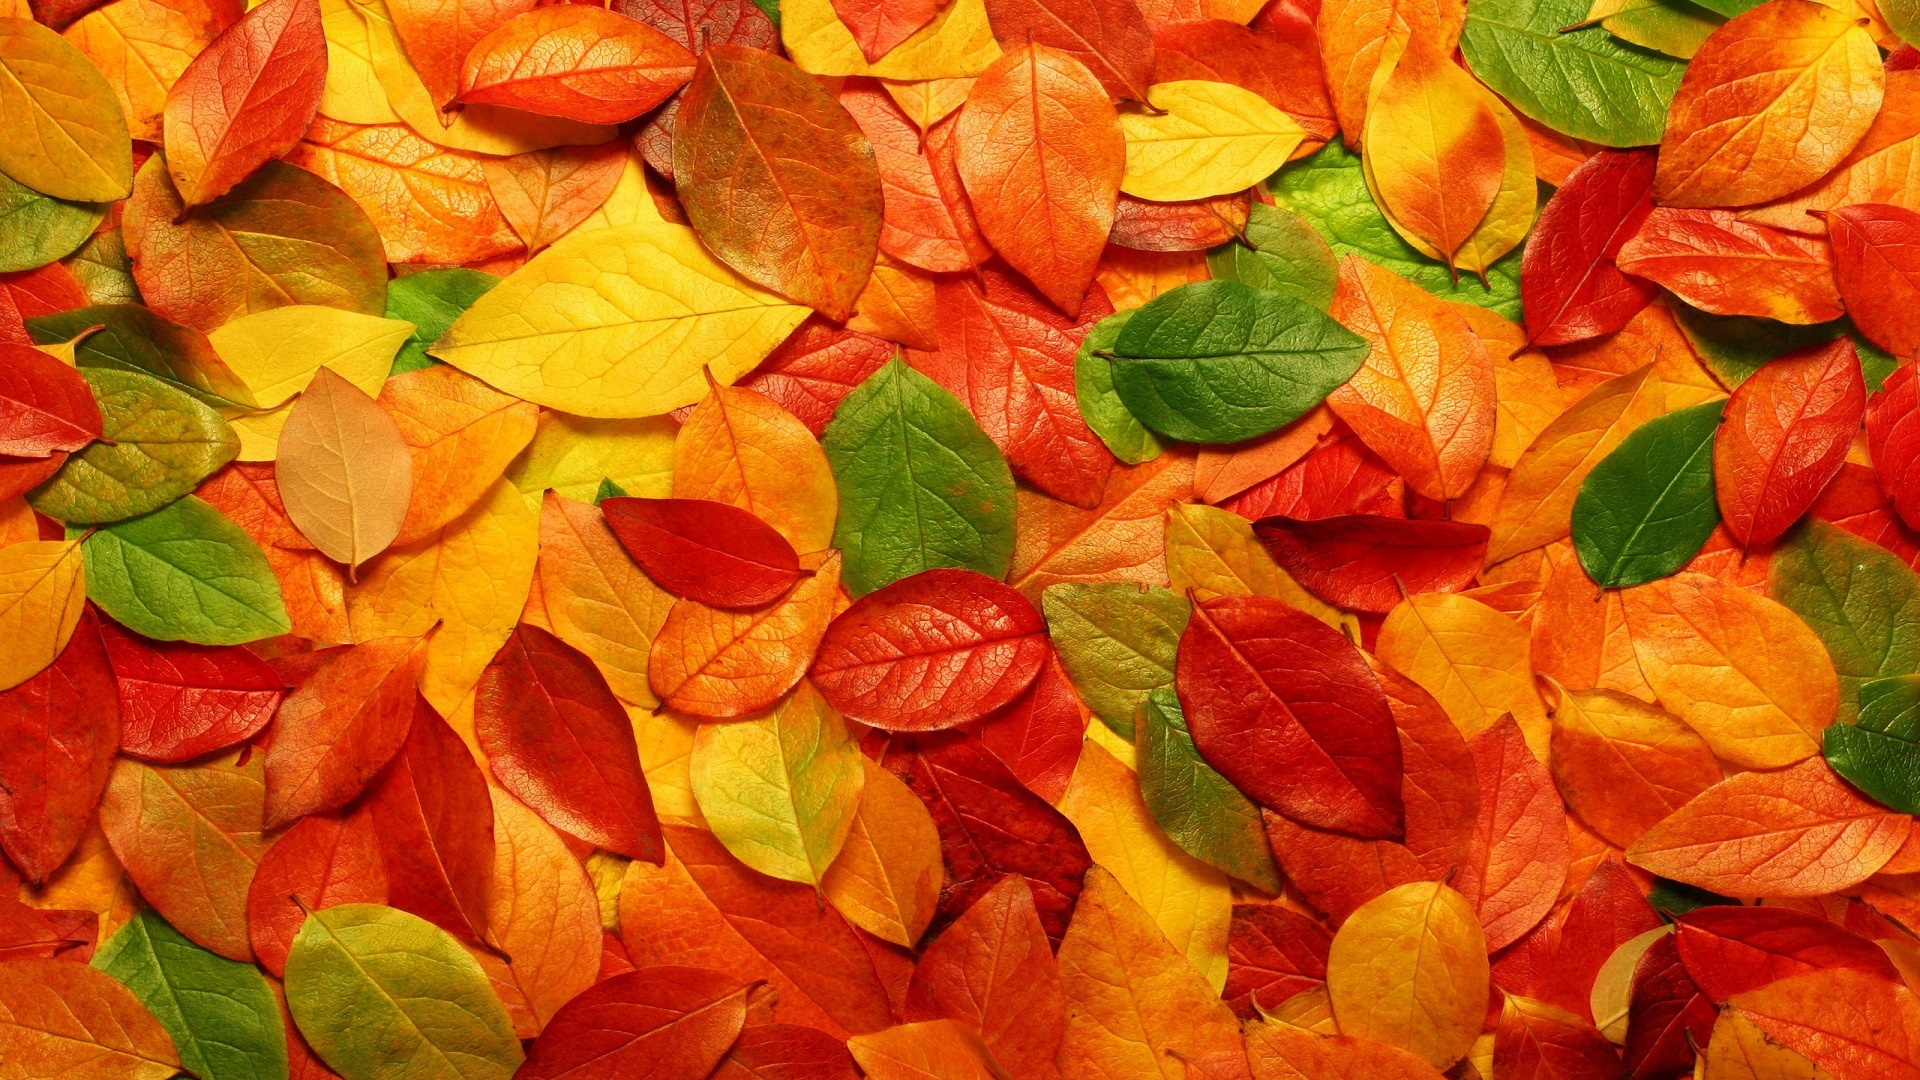 Autumn Desktop Wallpapers The Colors That We Enjoy1105 Hd Wallpaper